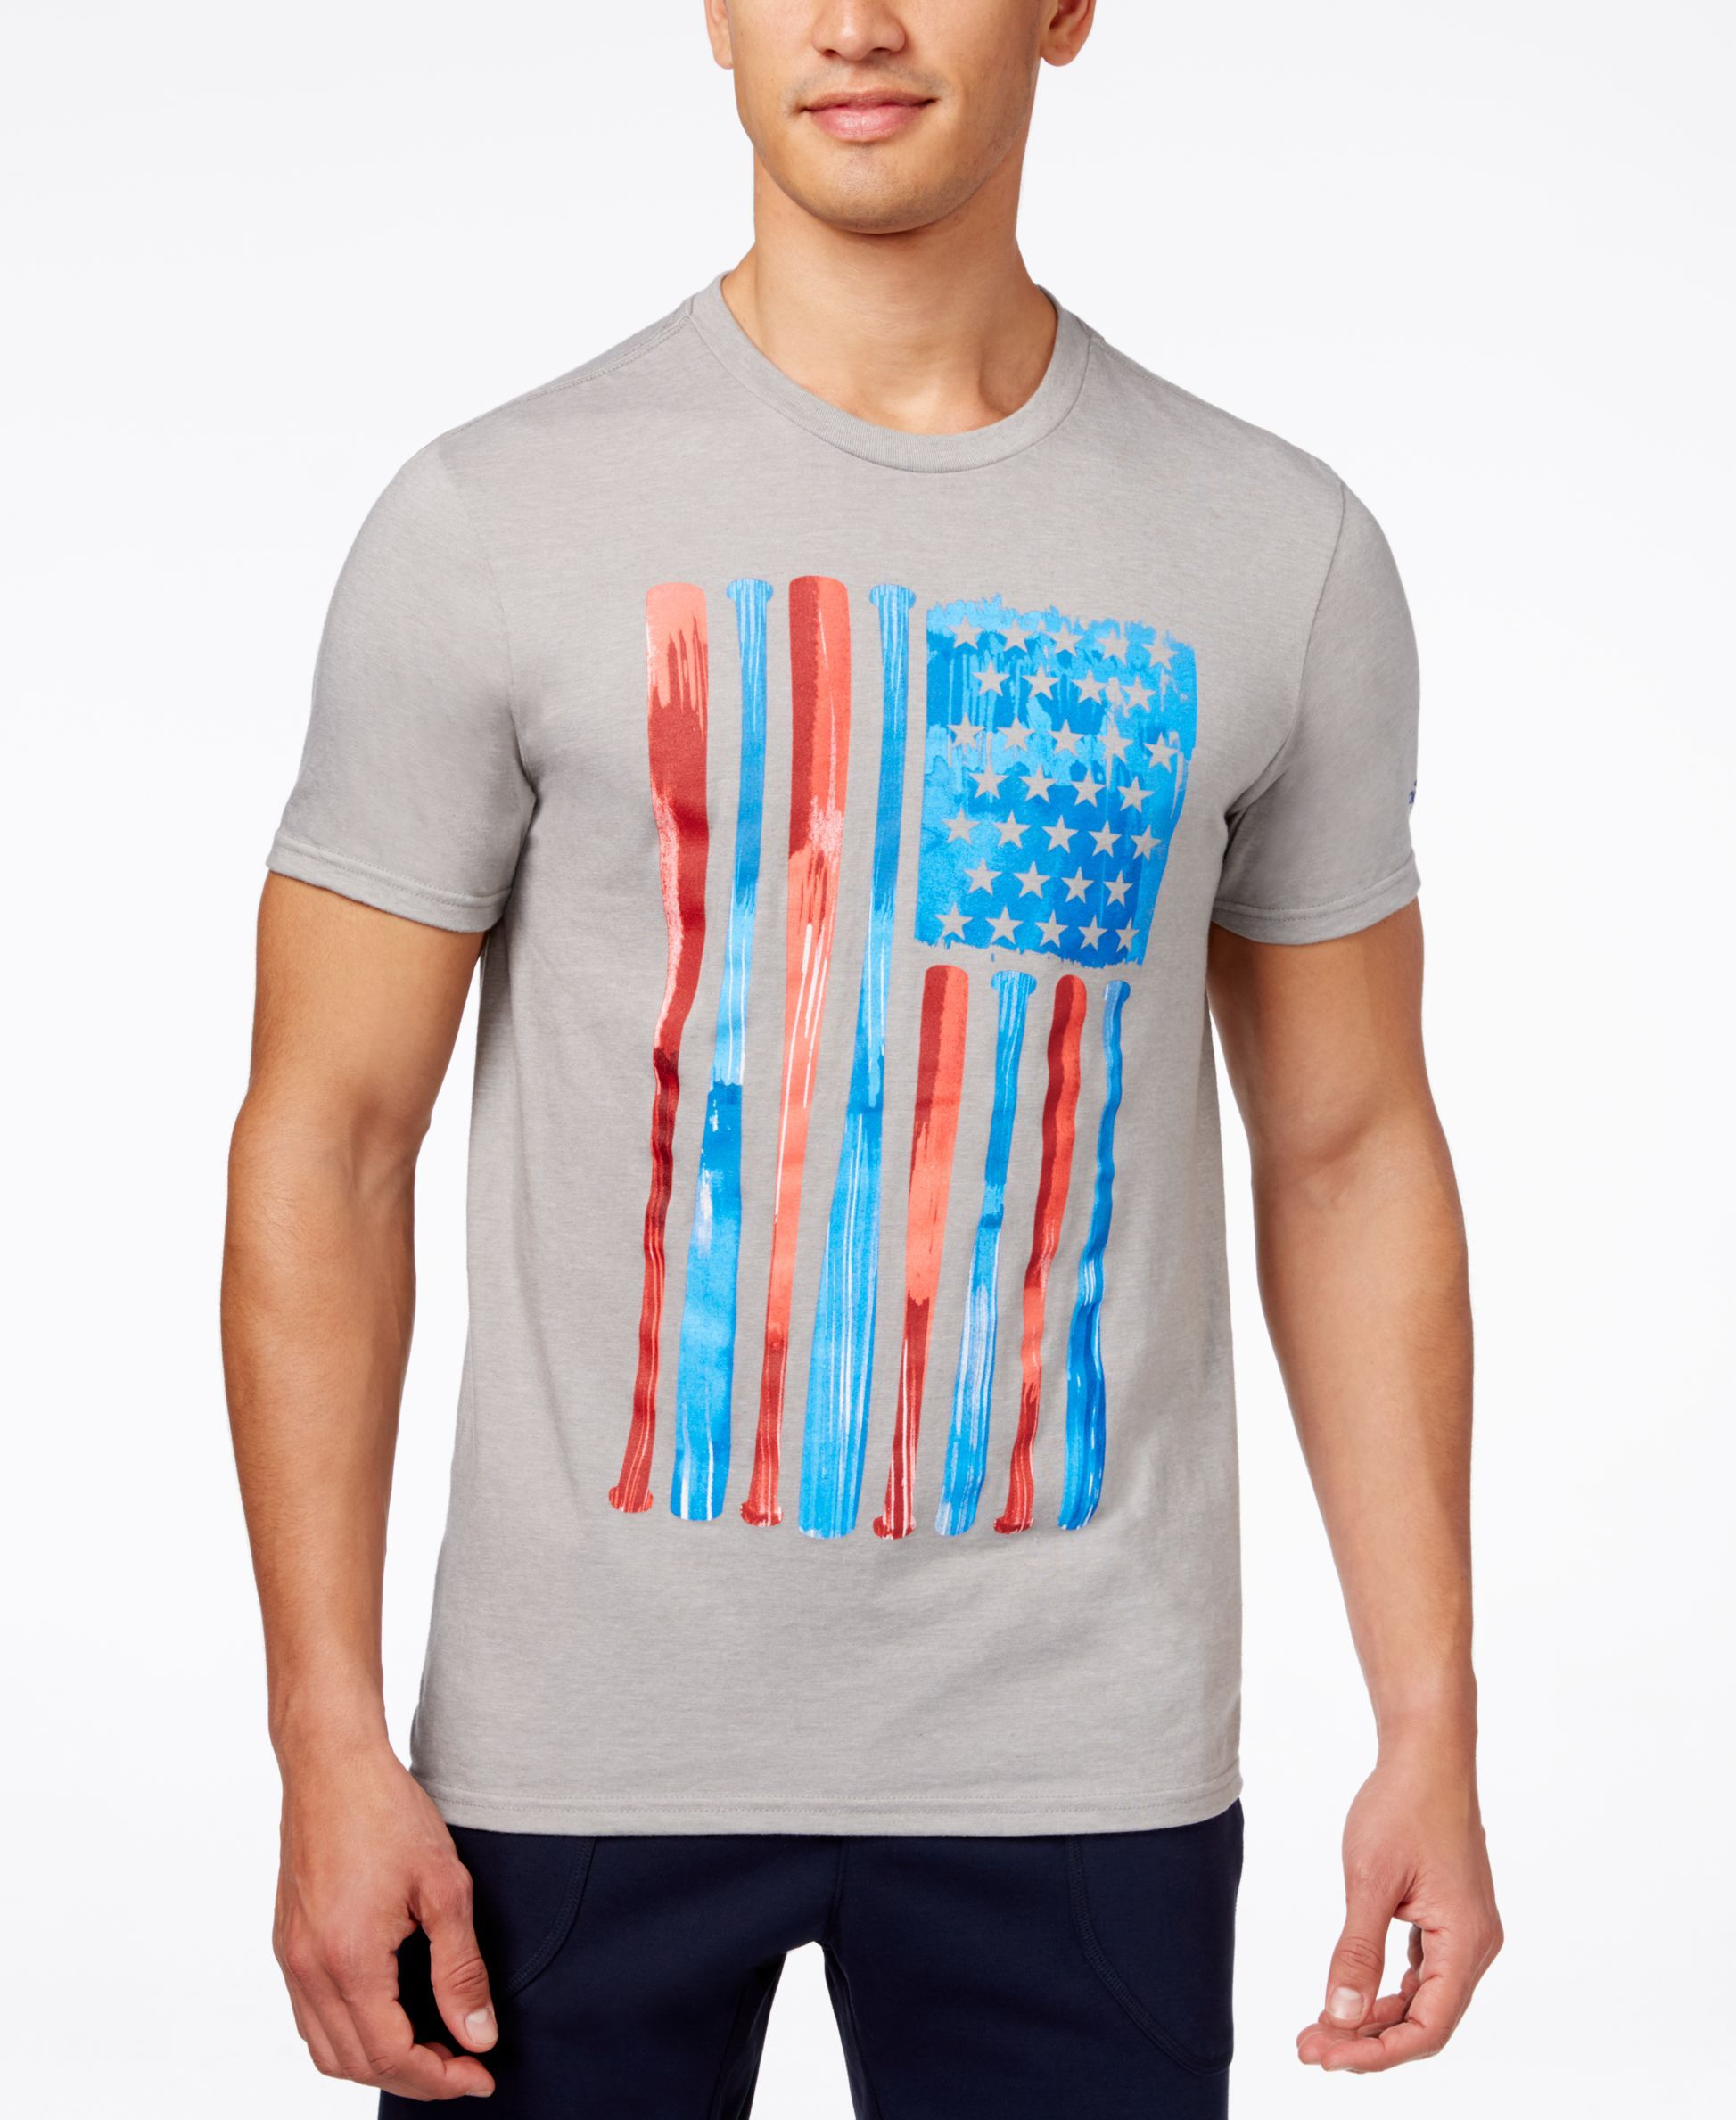 adidas Men's Flag Graphic T-Shirt